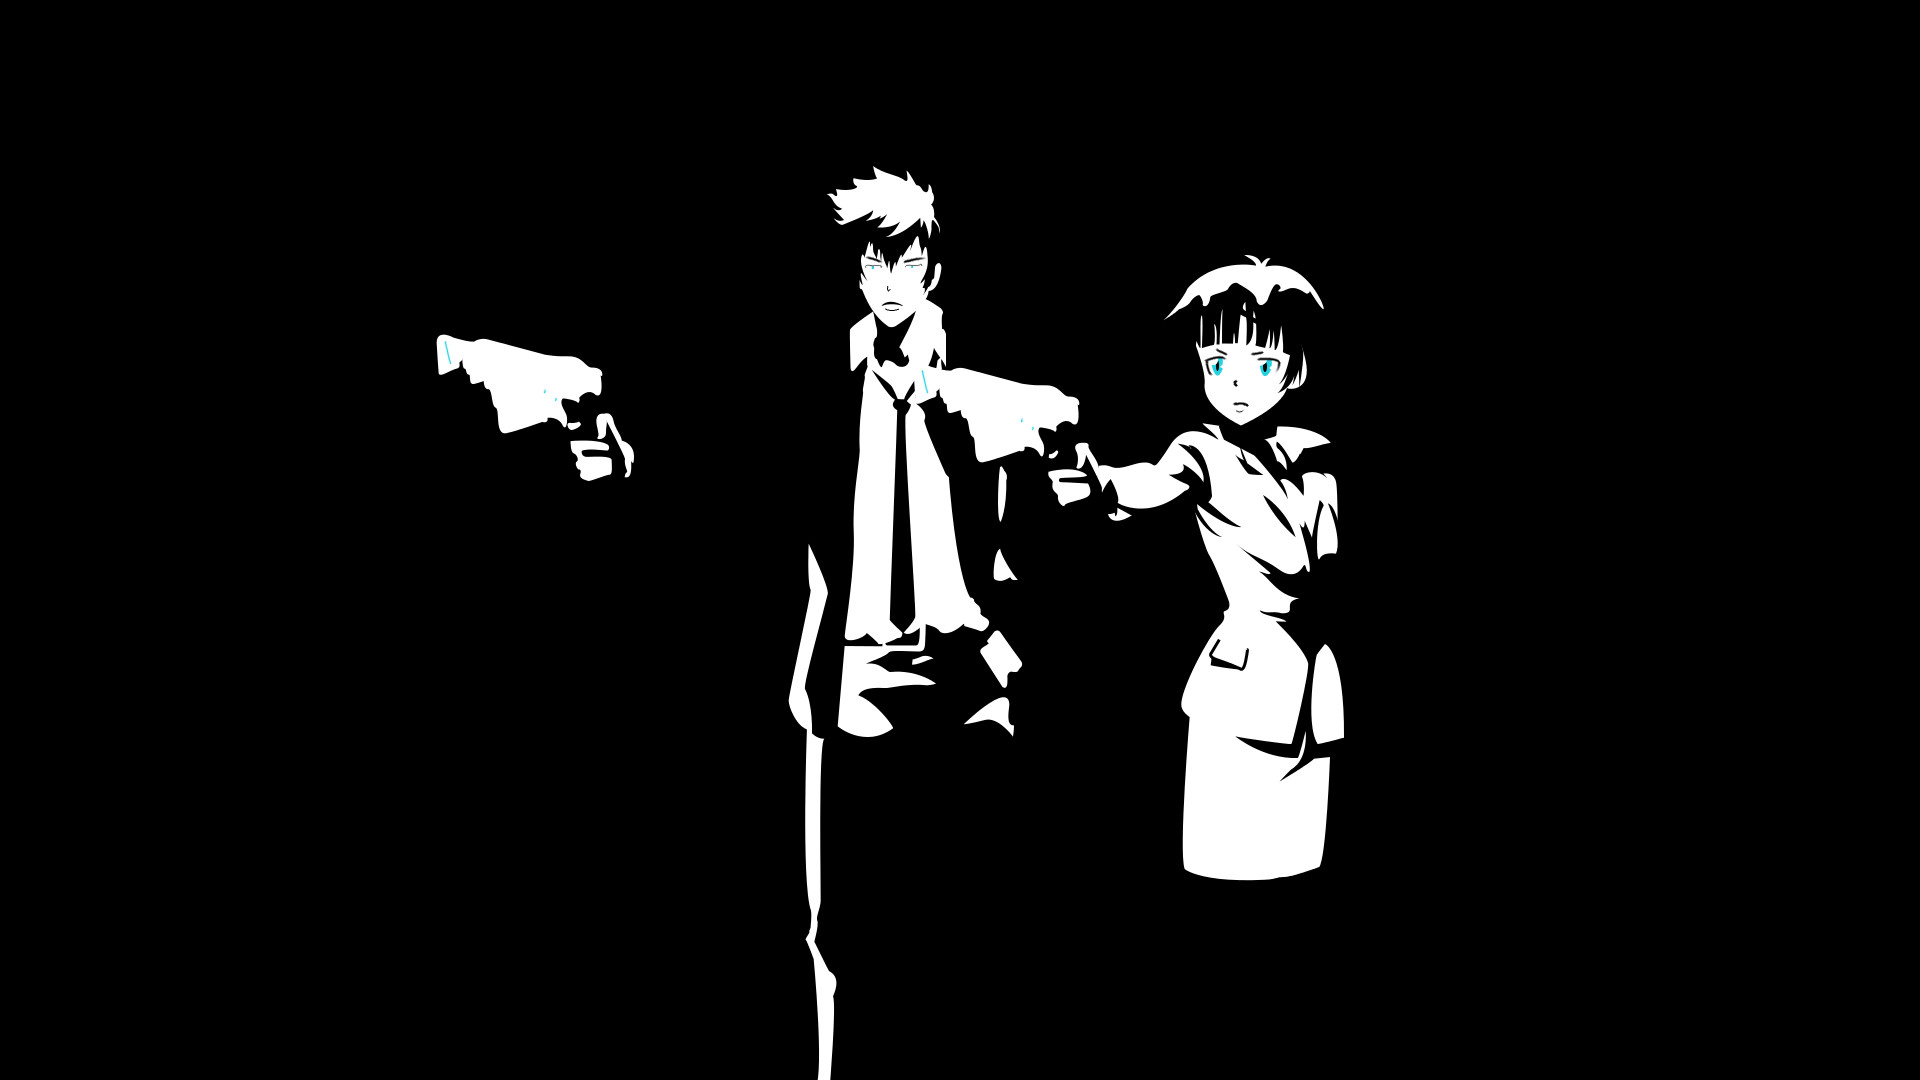 Pulp Fiction Background 65 Images